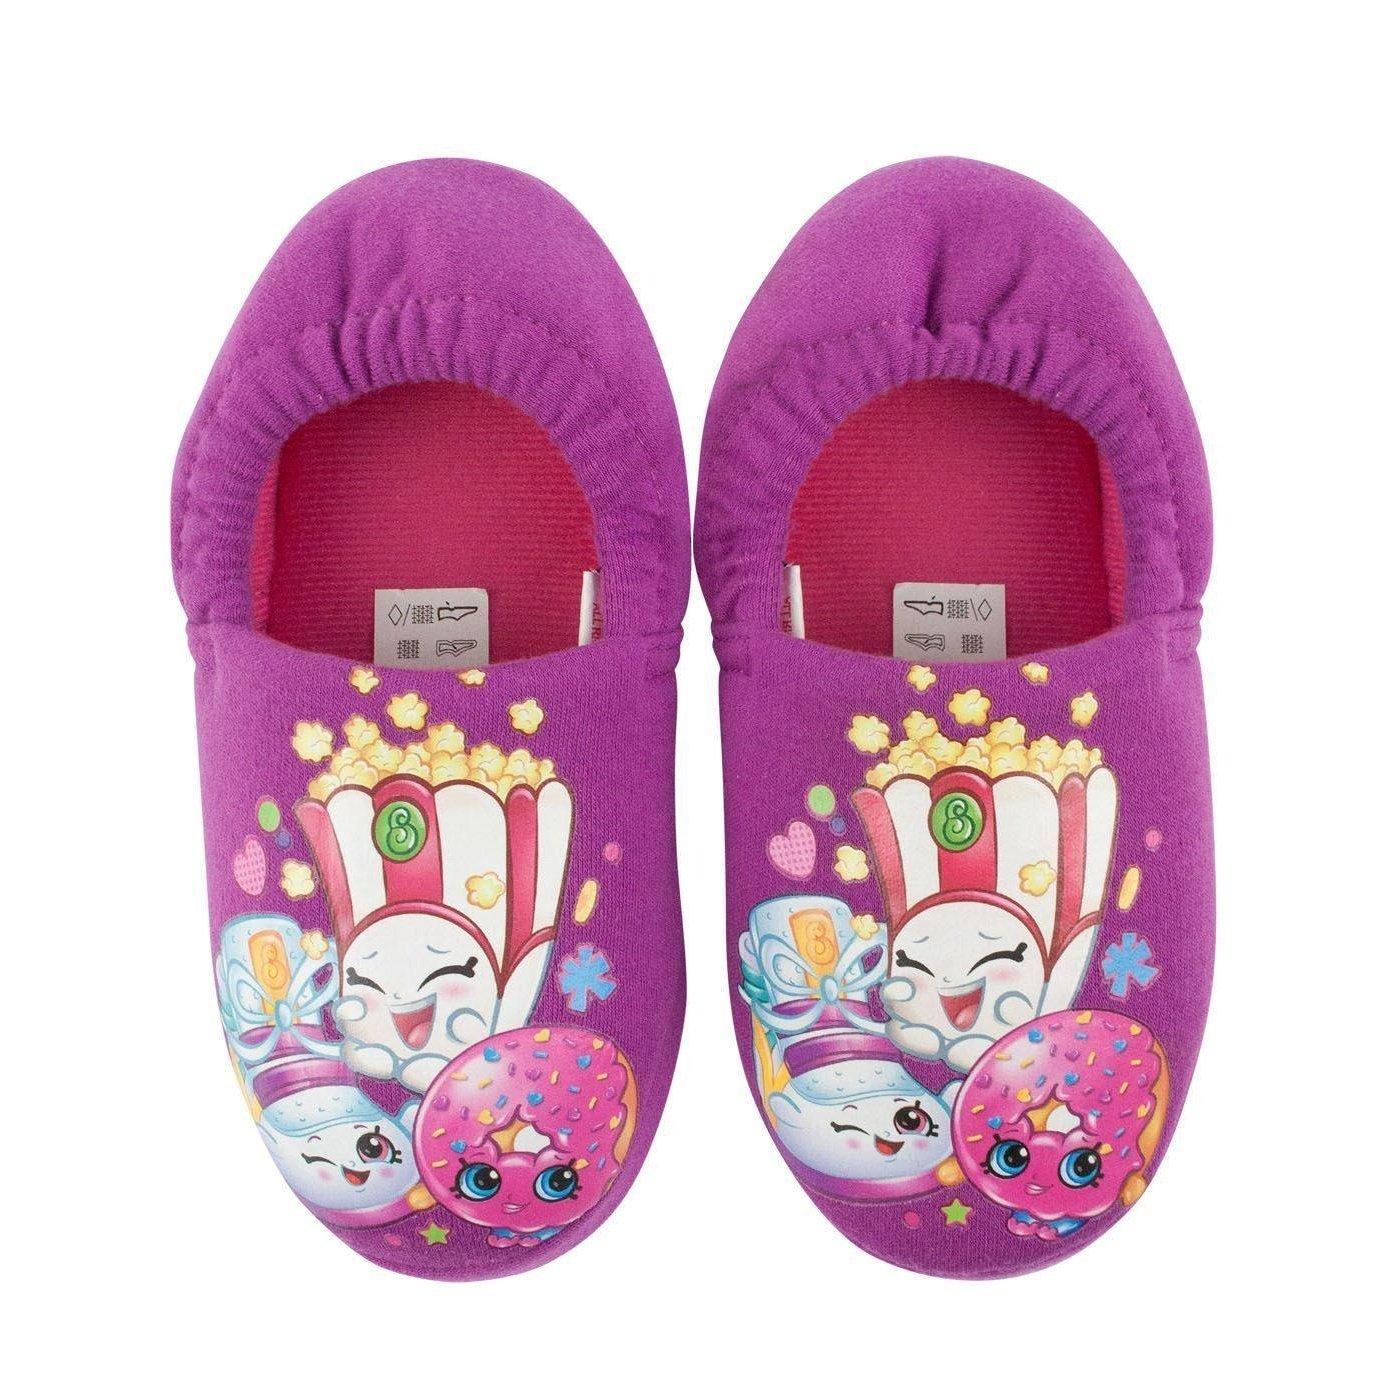 Shopkins Girl's Slippers (9 UK Kids) William Lamb UTNS4688_9